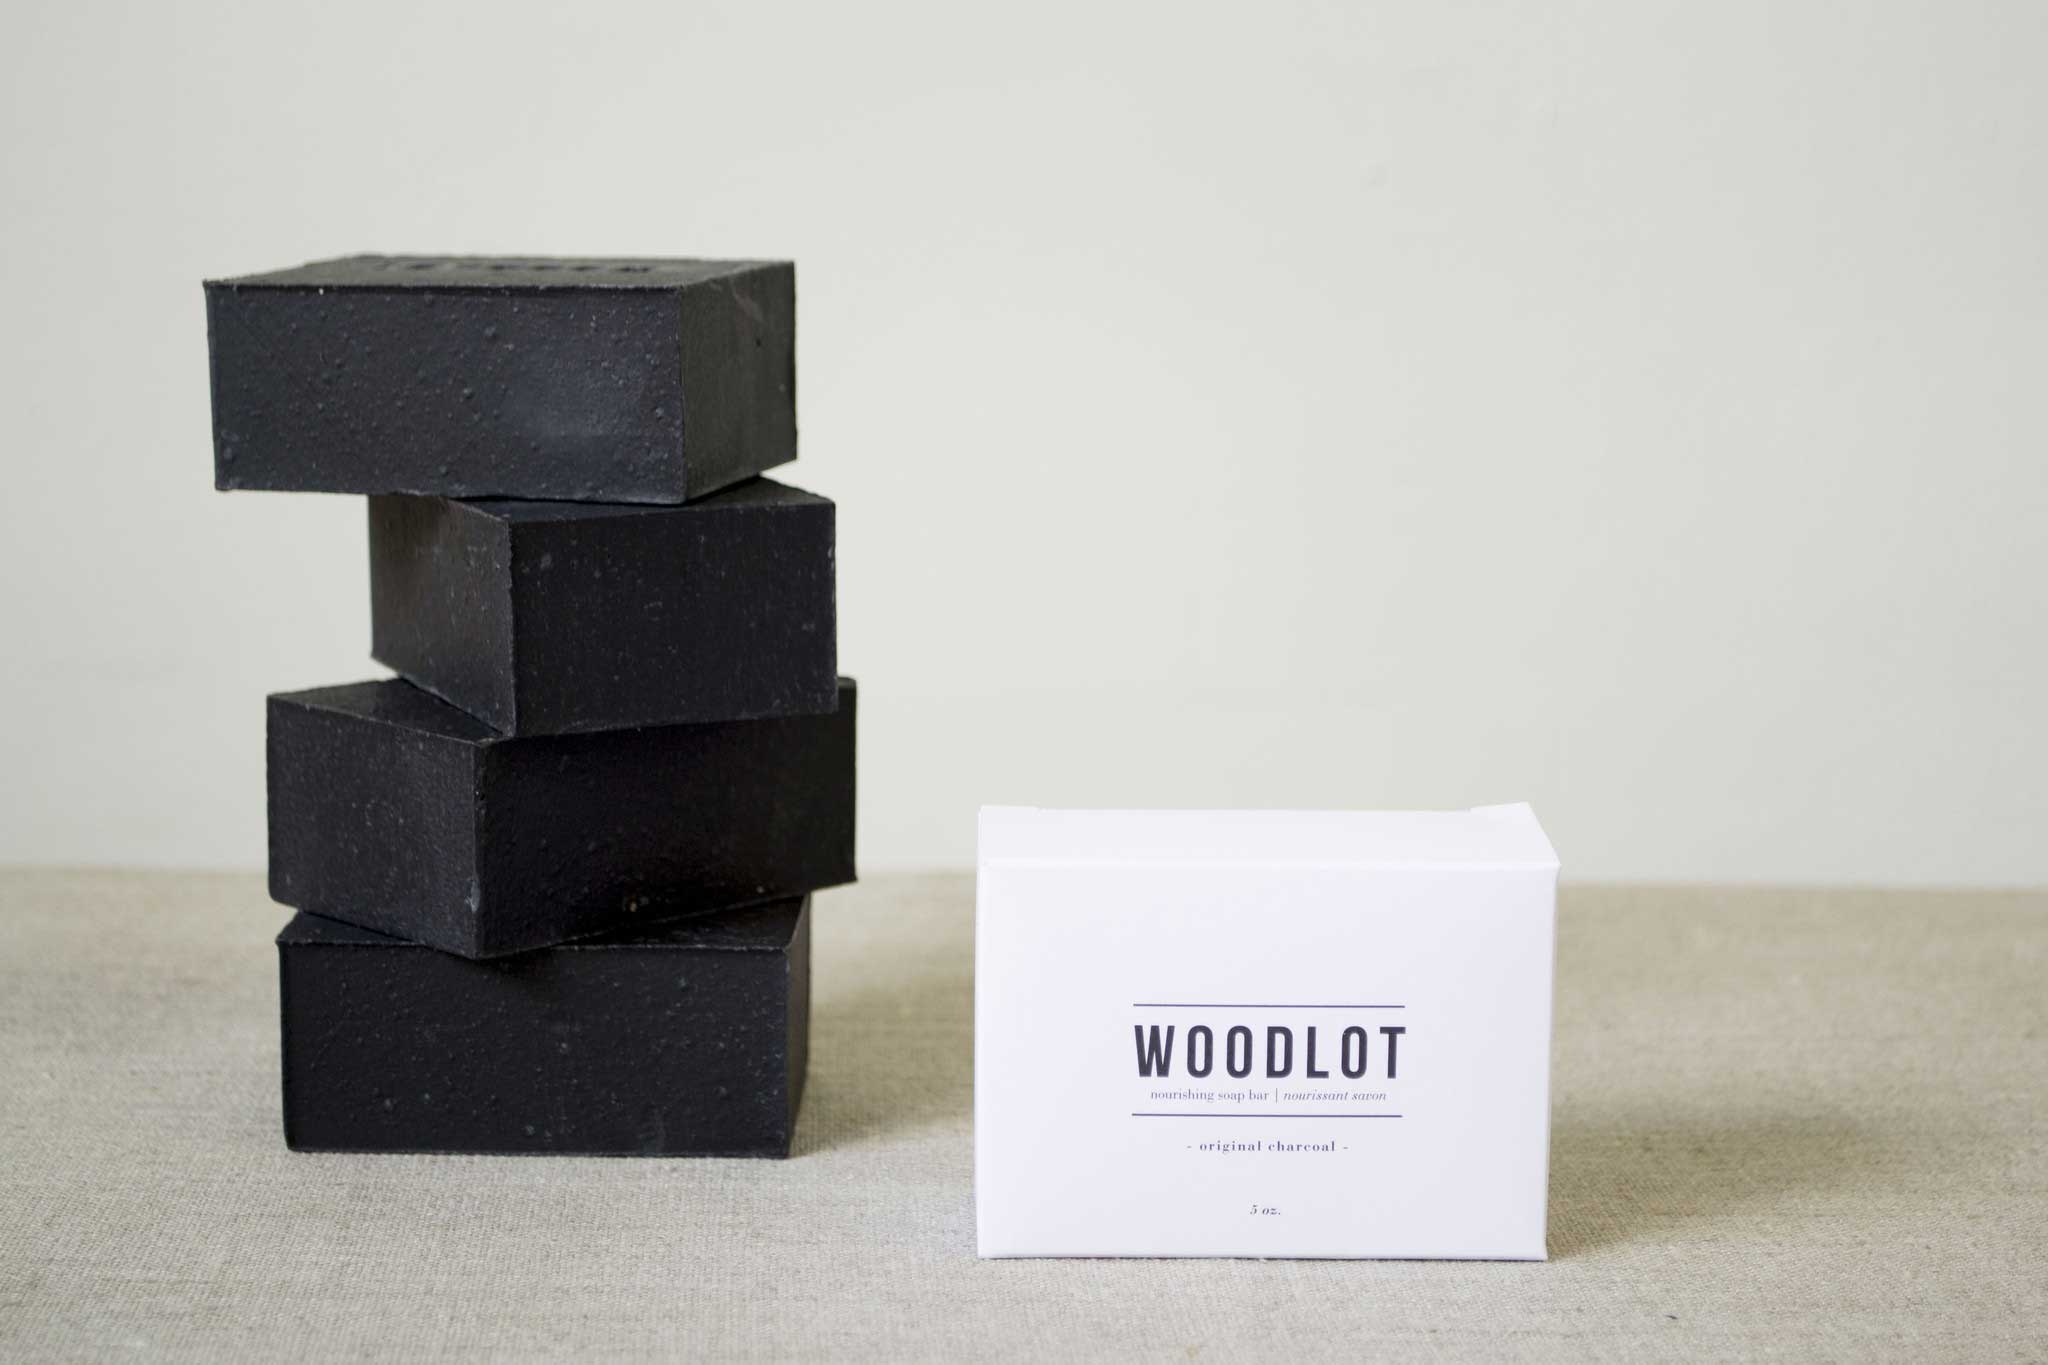 duurzame-huidverzorging-woodlot-black-charcoal-soap